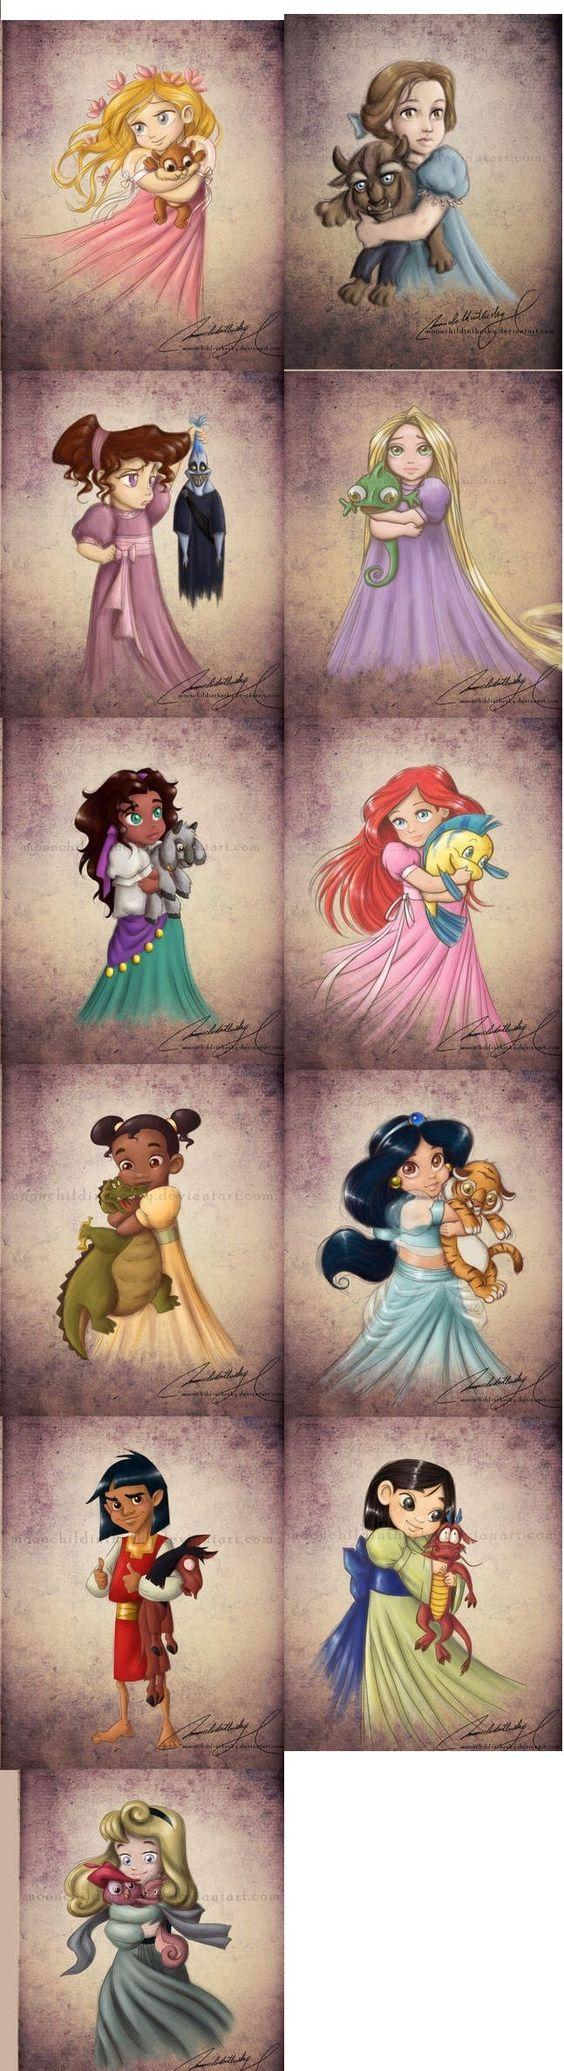 OMG LOOOOVE & love that they included #Kusko :) #disney #princess babies